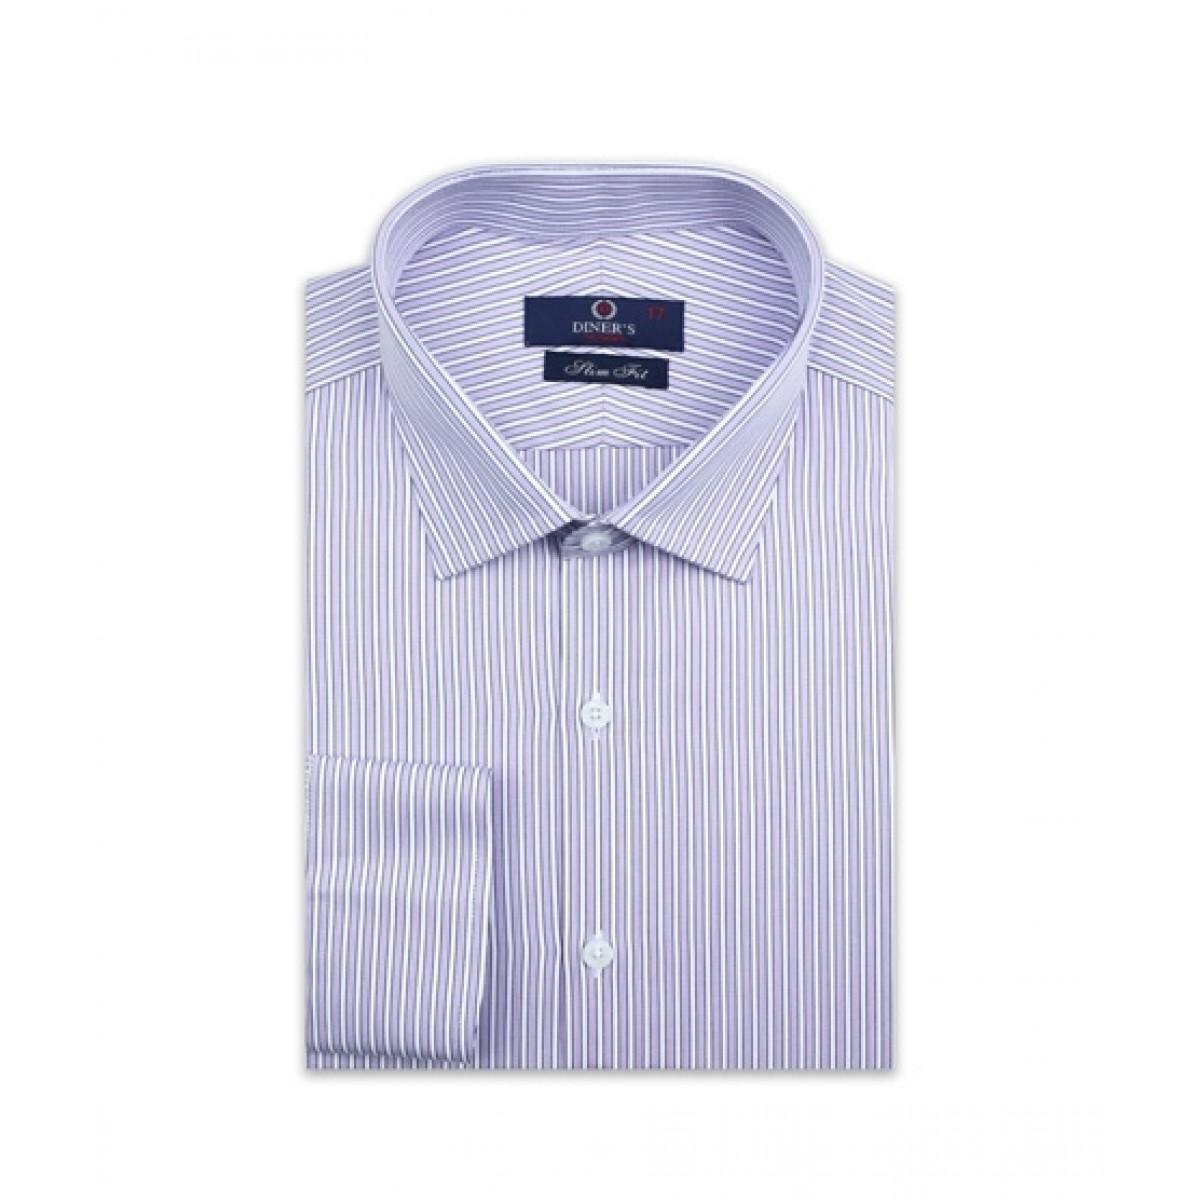 Diners Long Sleeves Formal Shirt For Men Purple (AH19334)